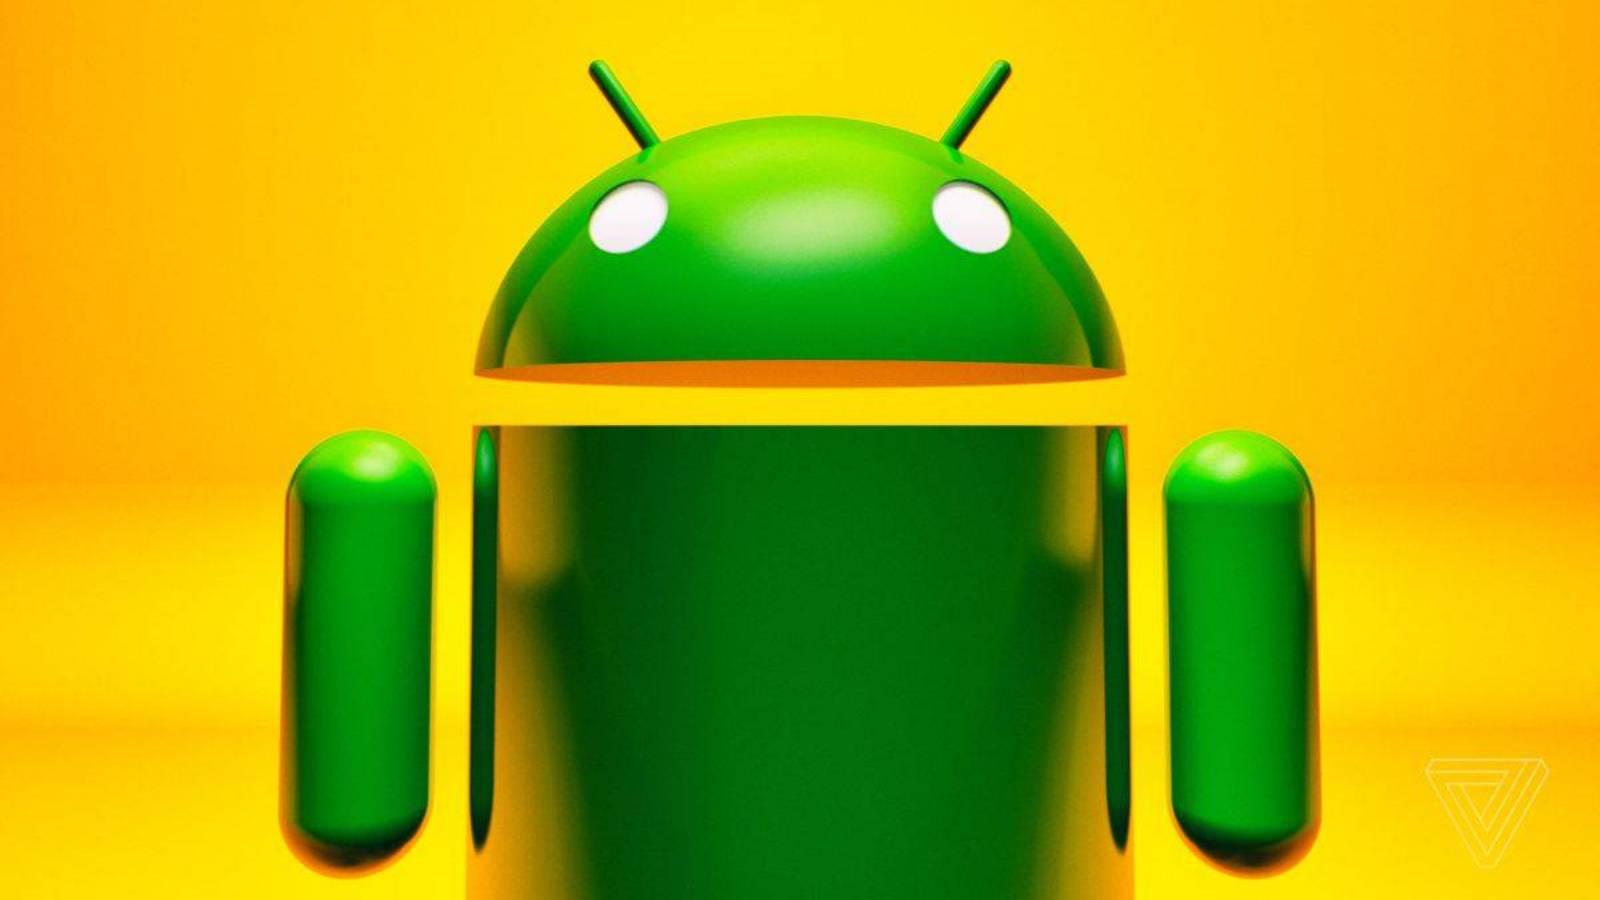 android apeluri calculator